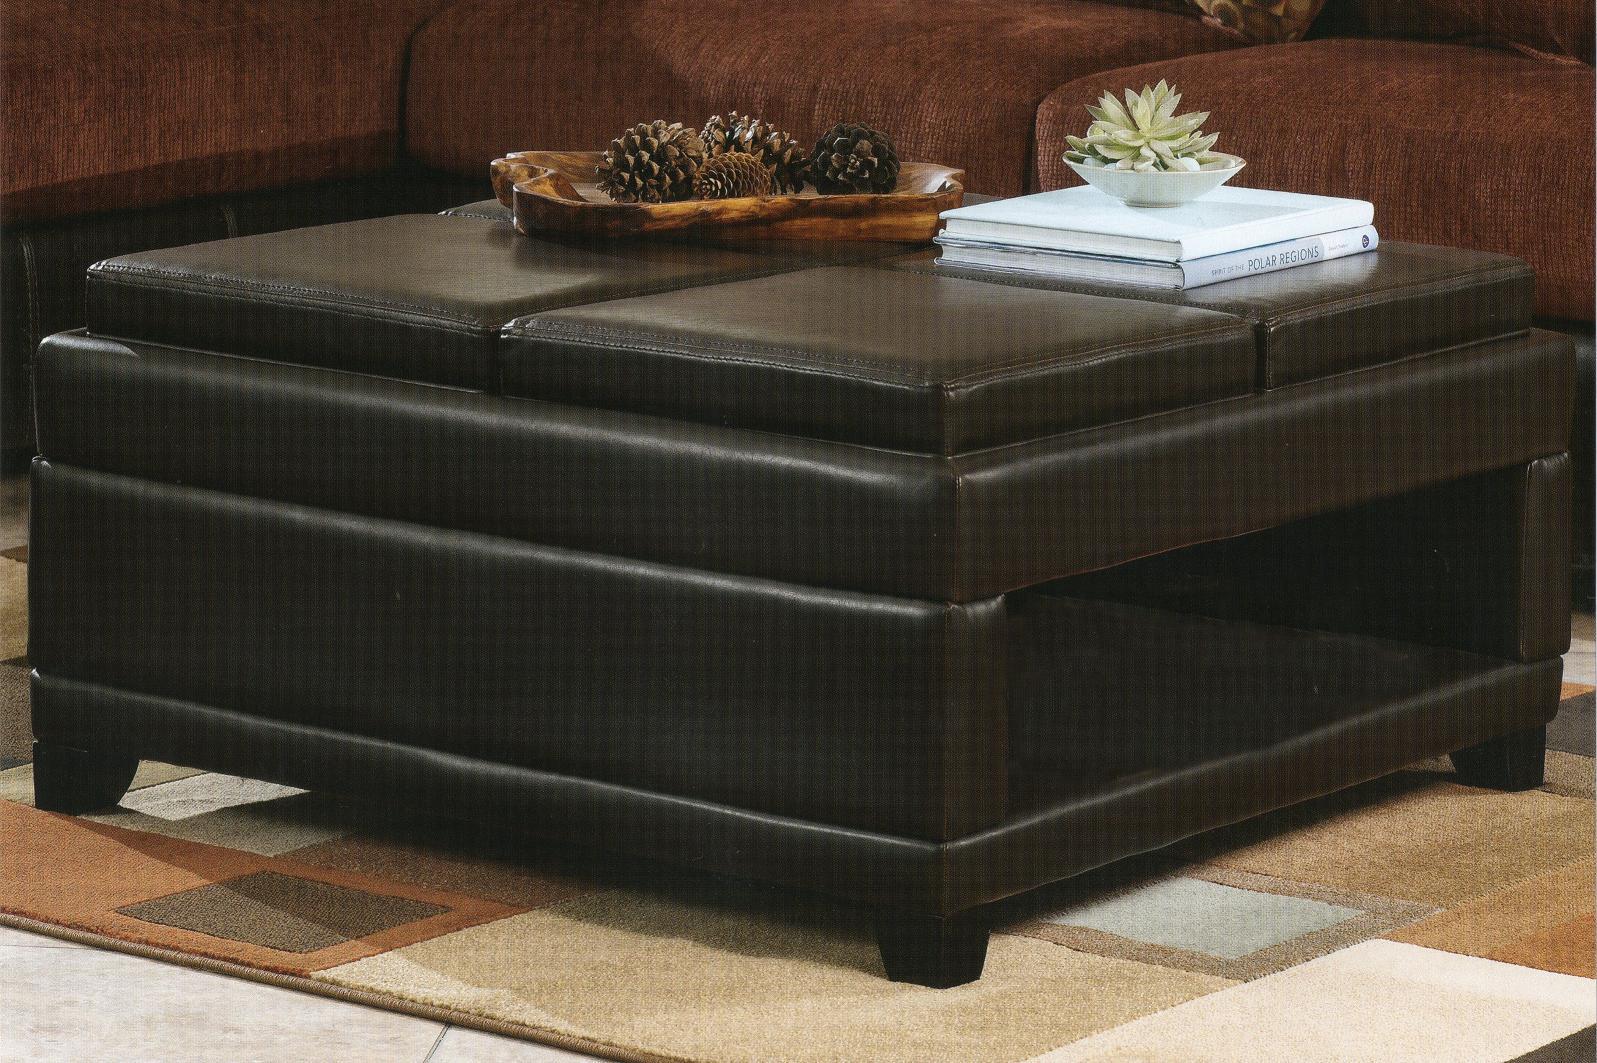 furniture table. Furniture Table